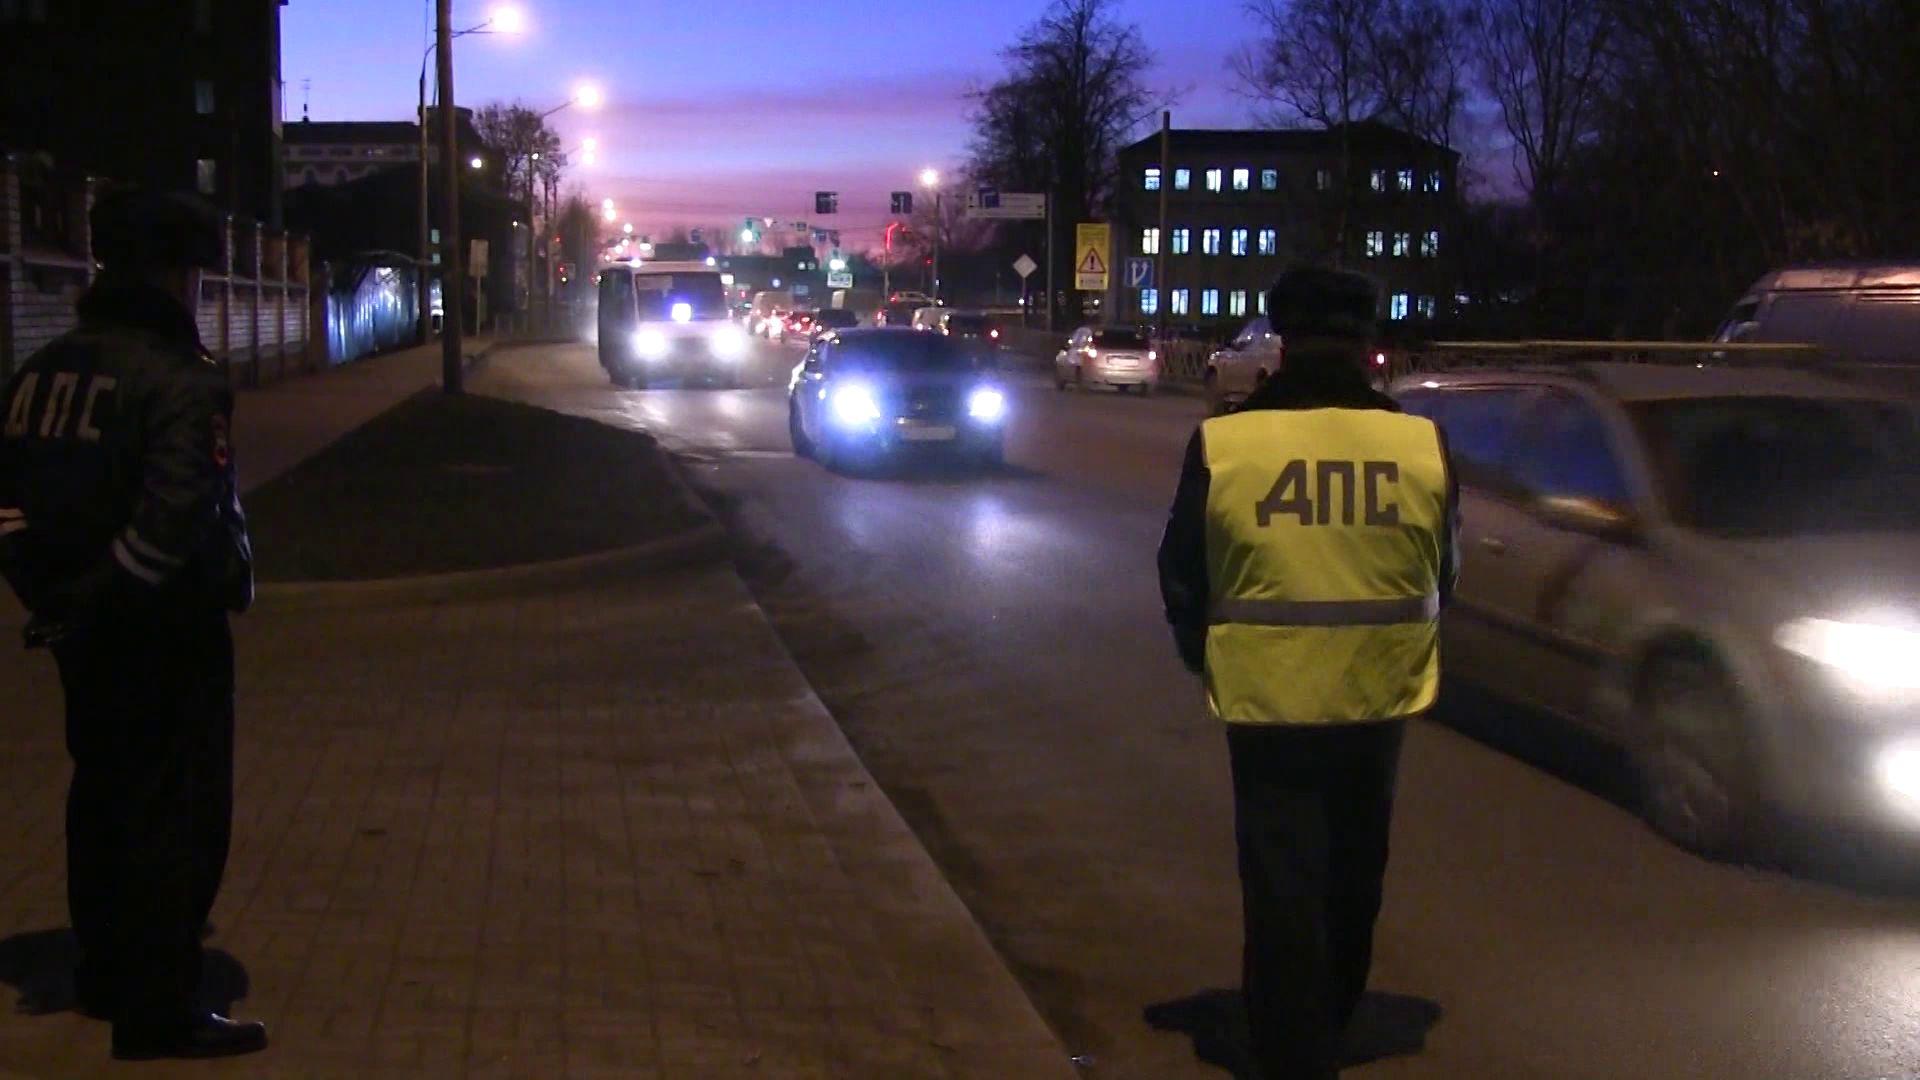 В Ярославле возросло количество ДПТ по вине водителей автобусов и маршруток